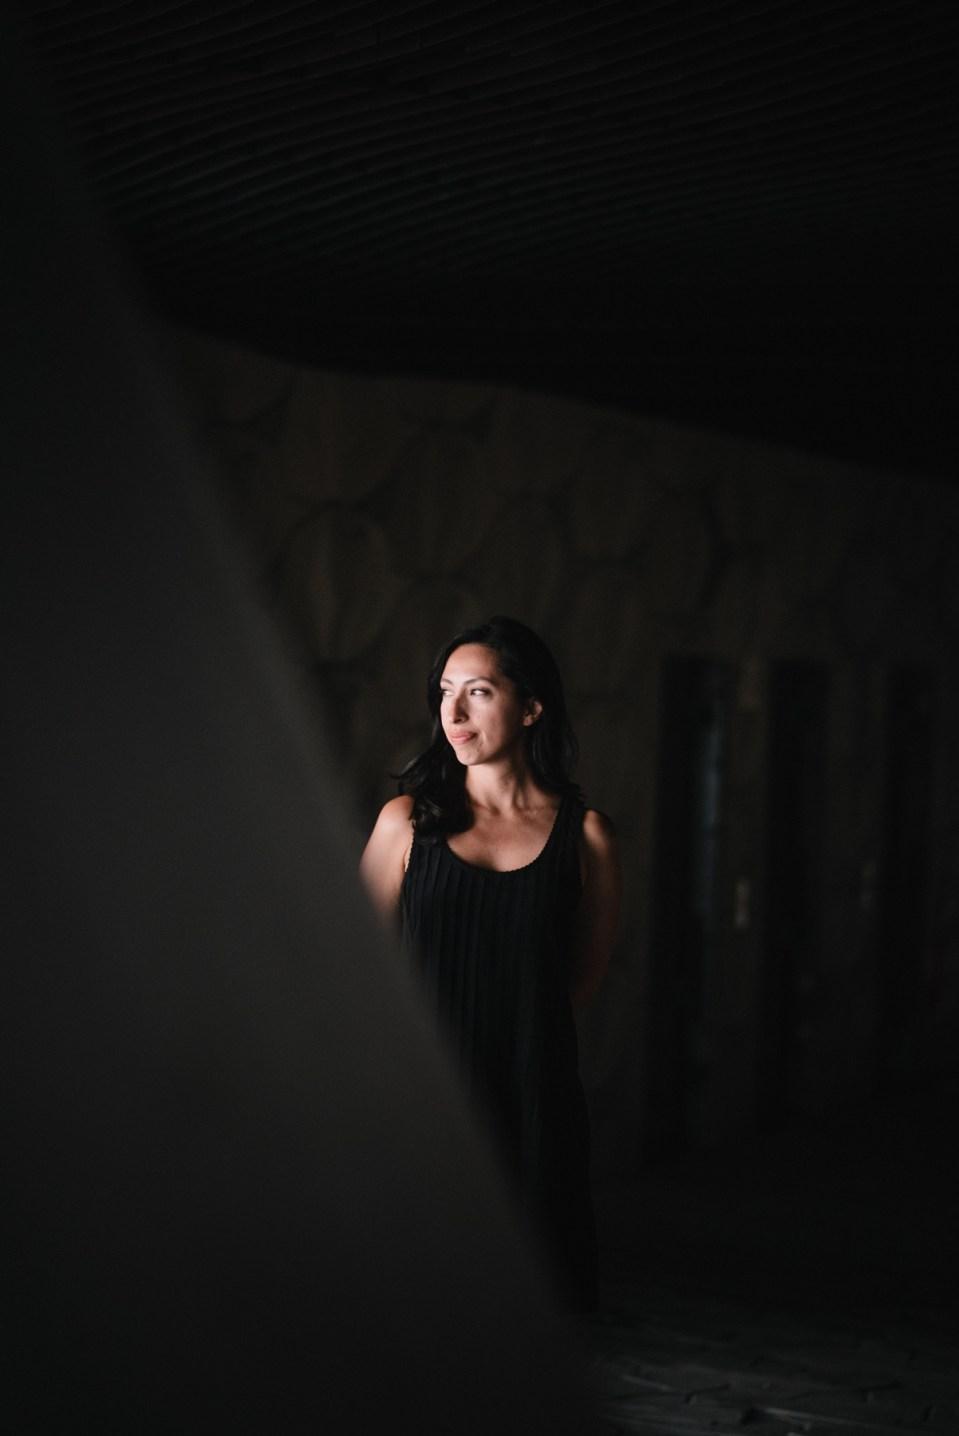 realgirls-portrait-women-filestyle-chloelapeyssonnie_00161